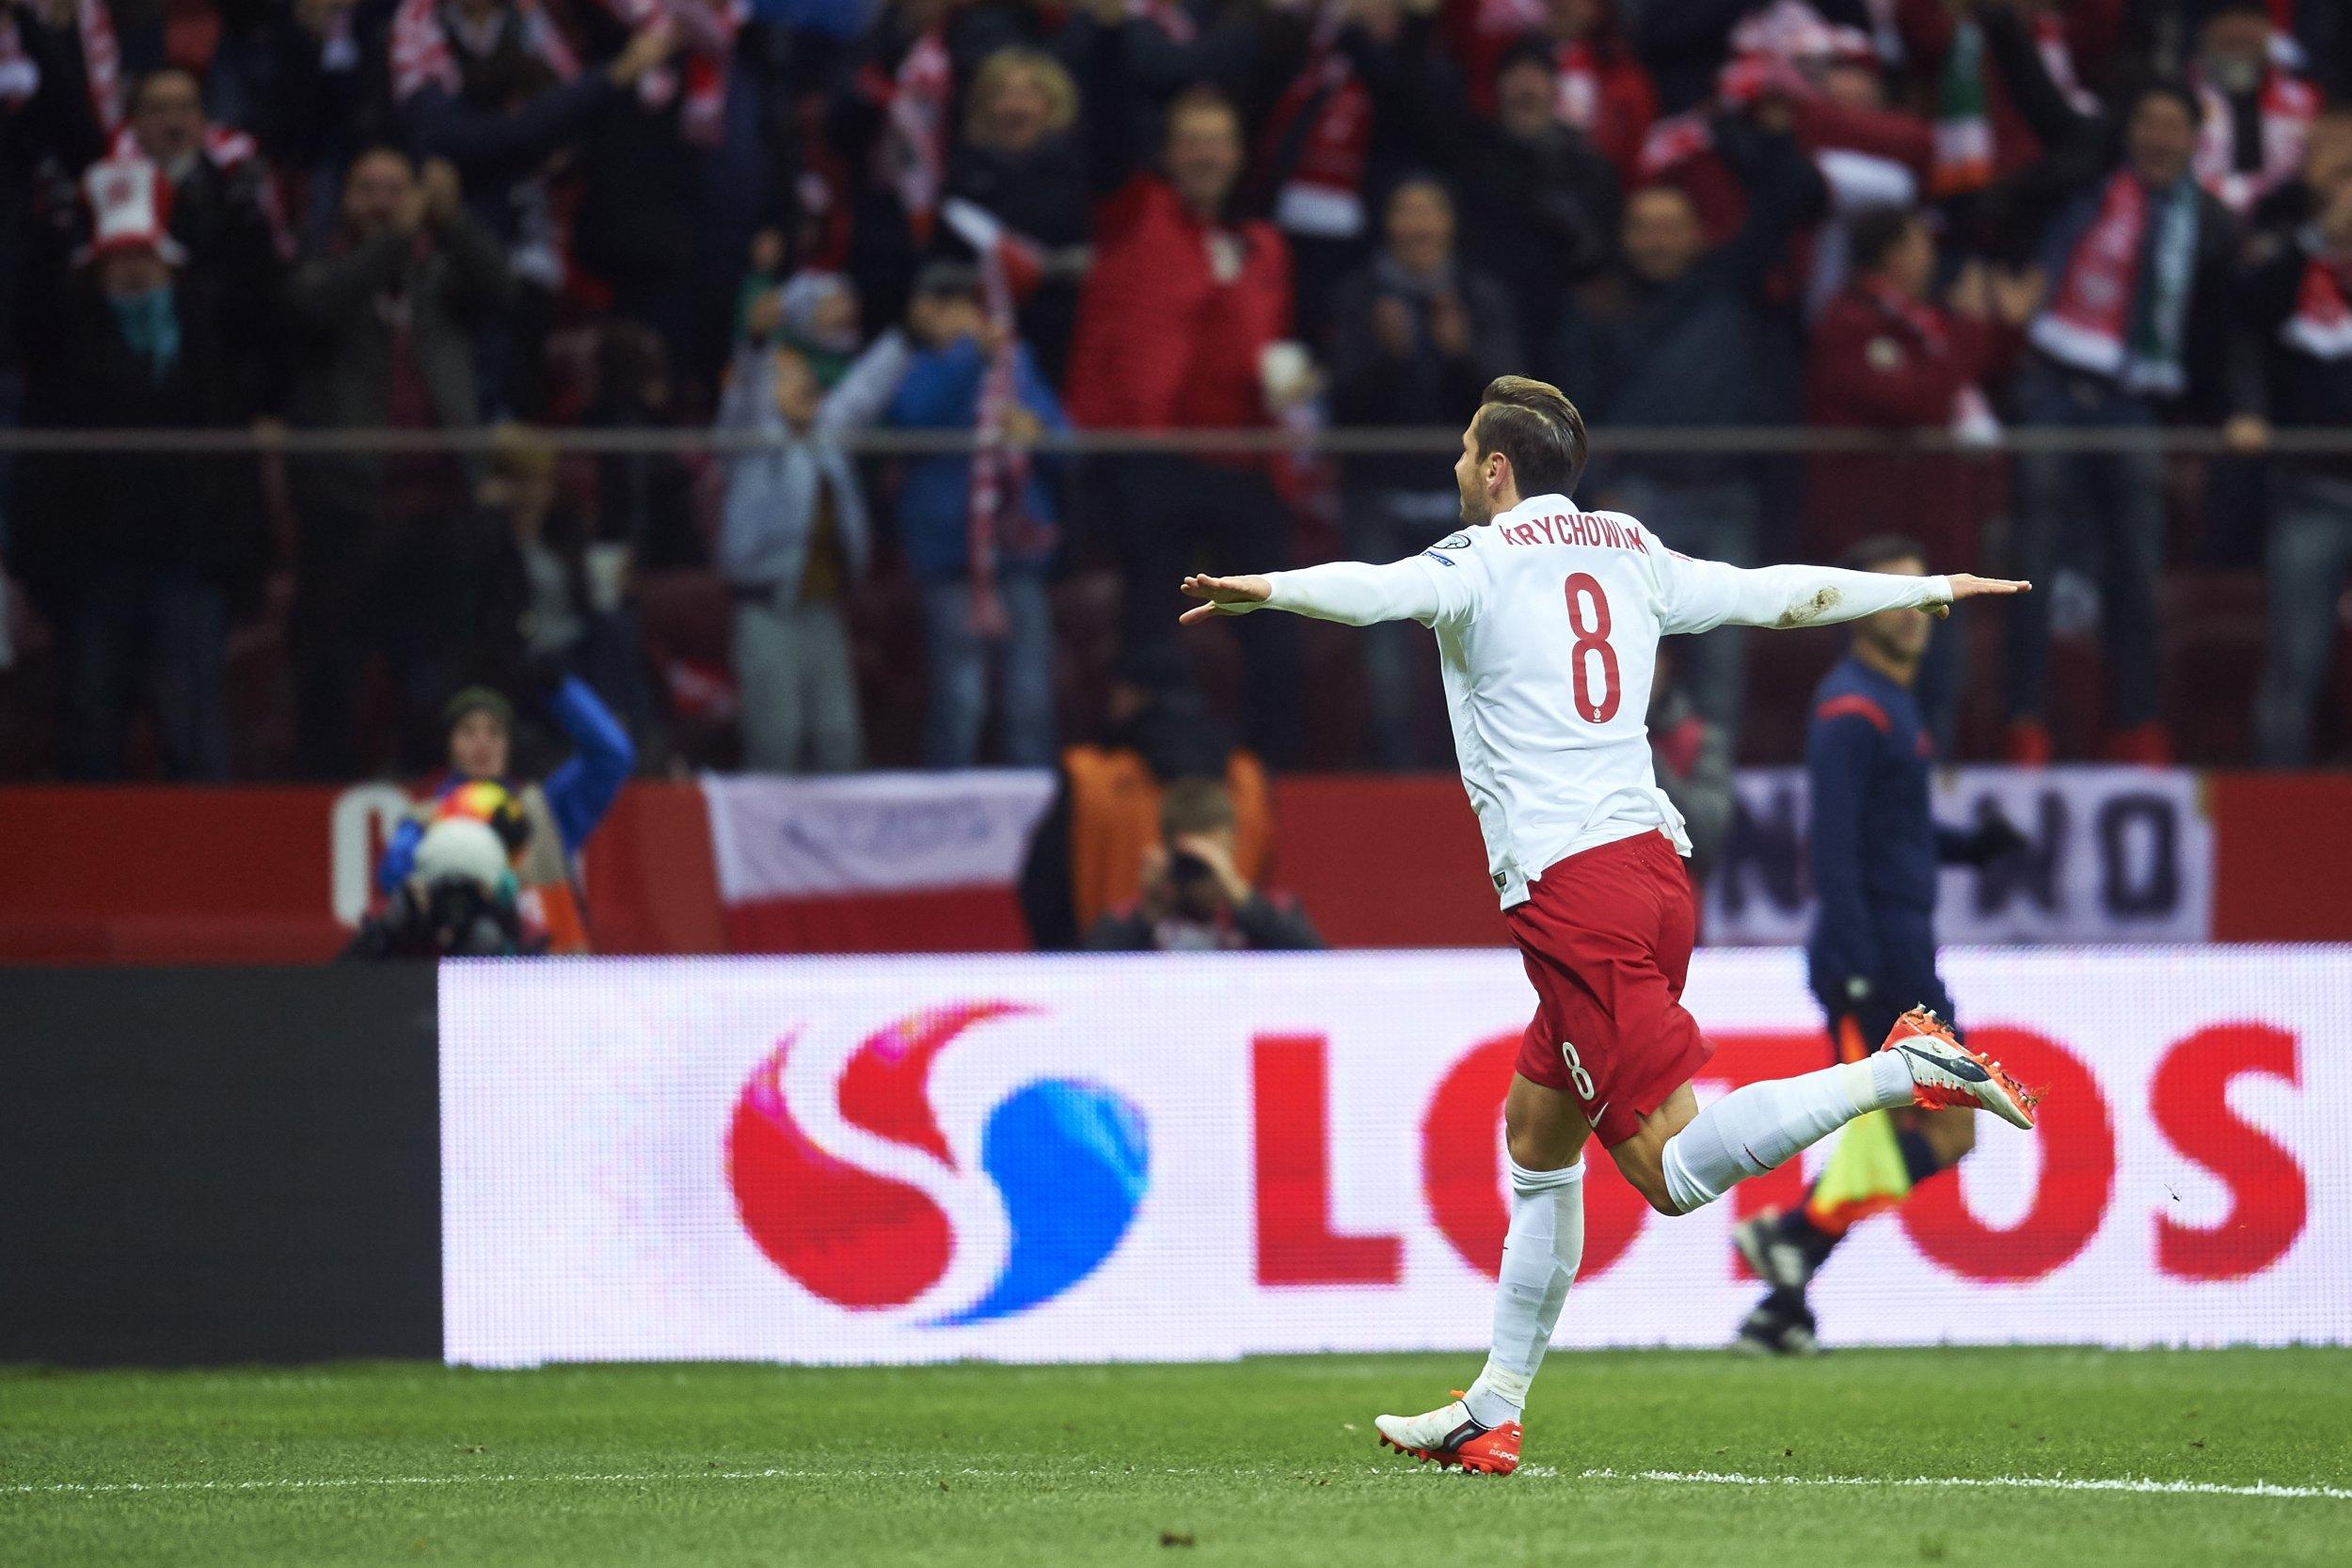 Grzegorz Krychowiak is a reported Arsenal transfer target